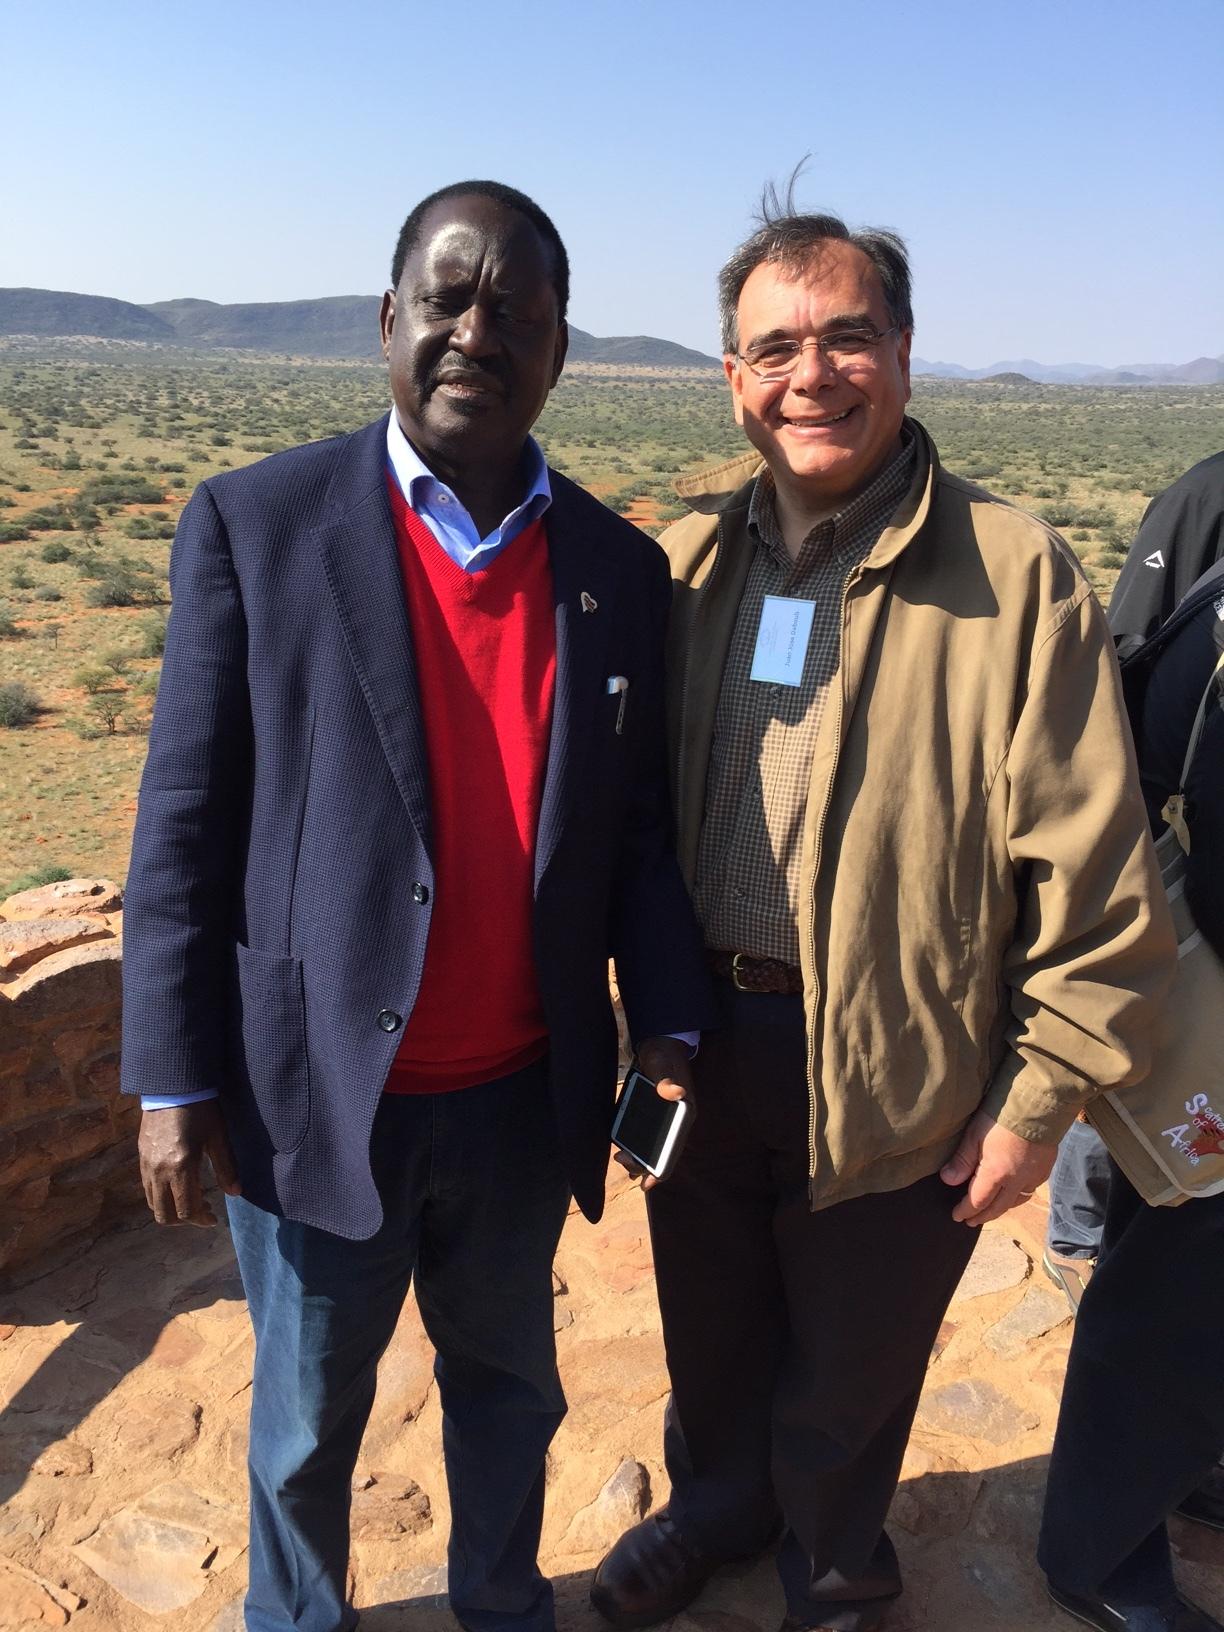 From left, former President of Kenya Raila Odinga, and Dr. Daboub